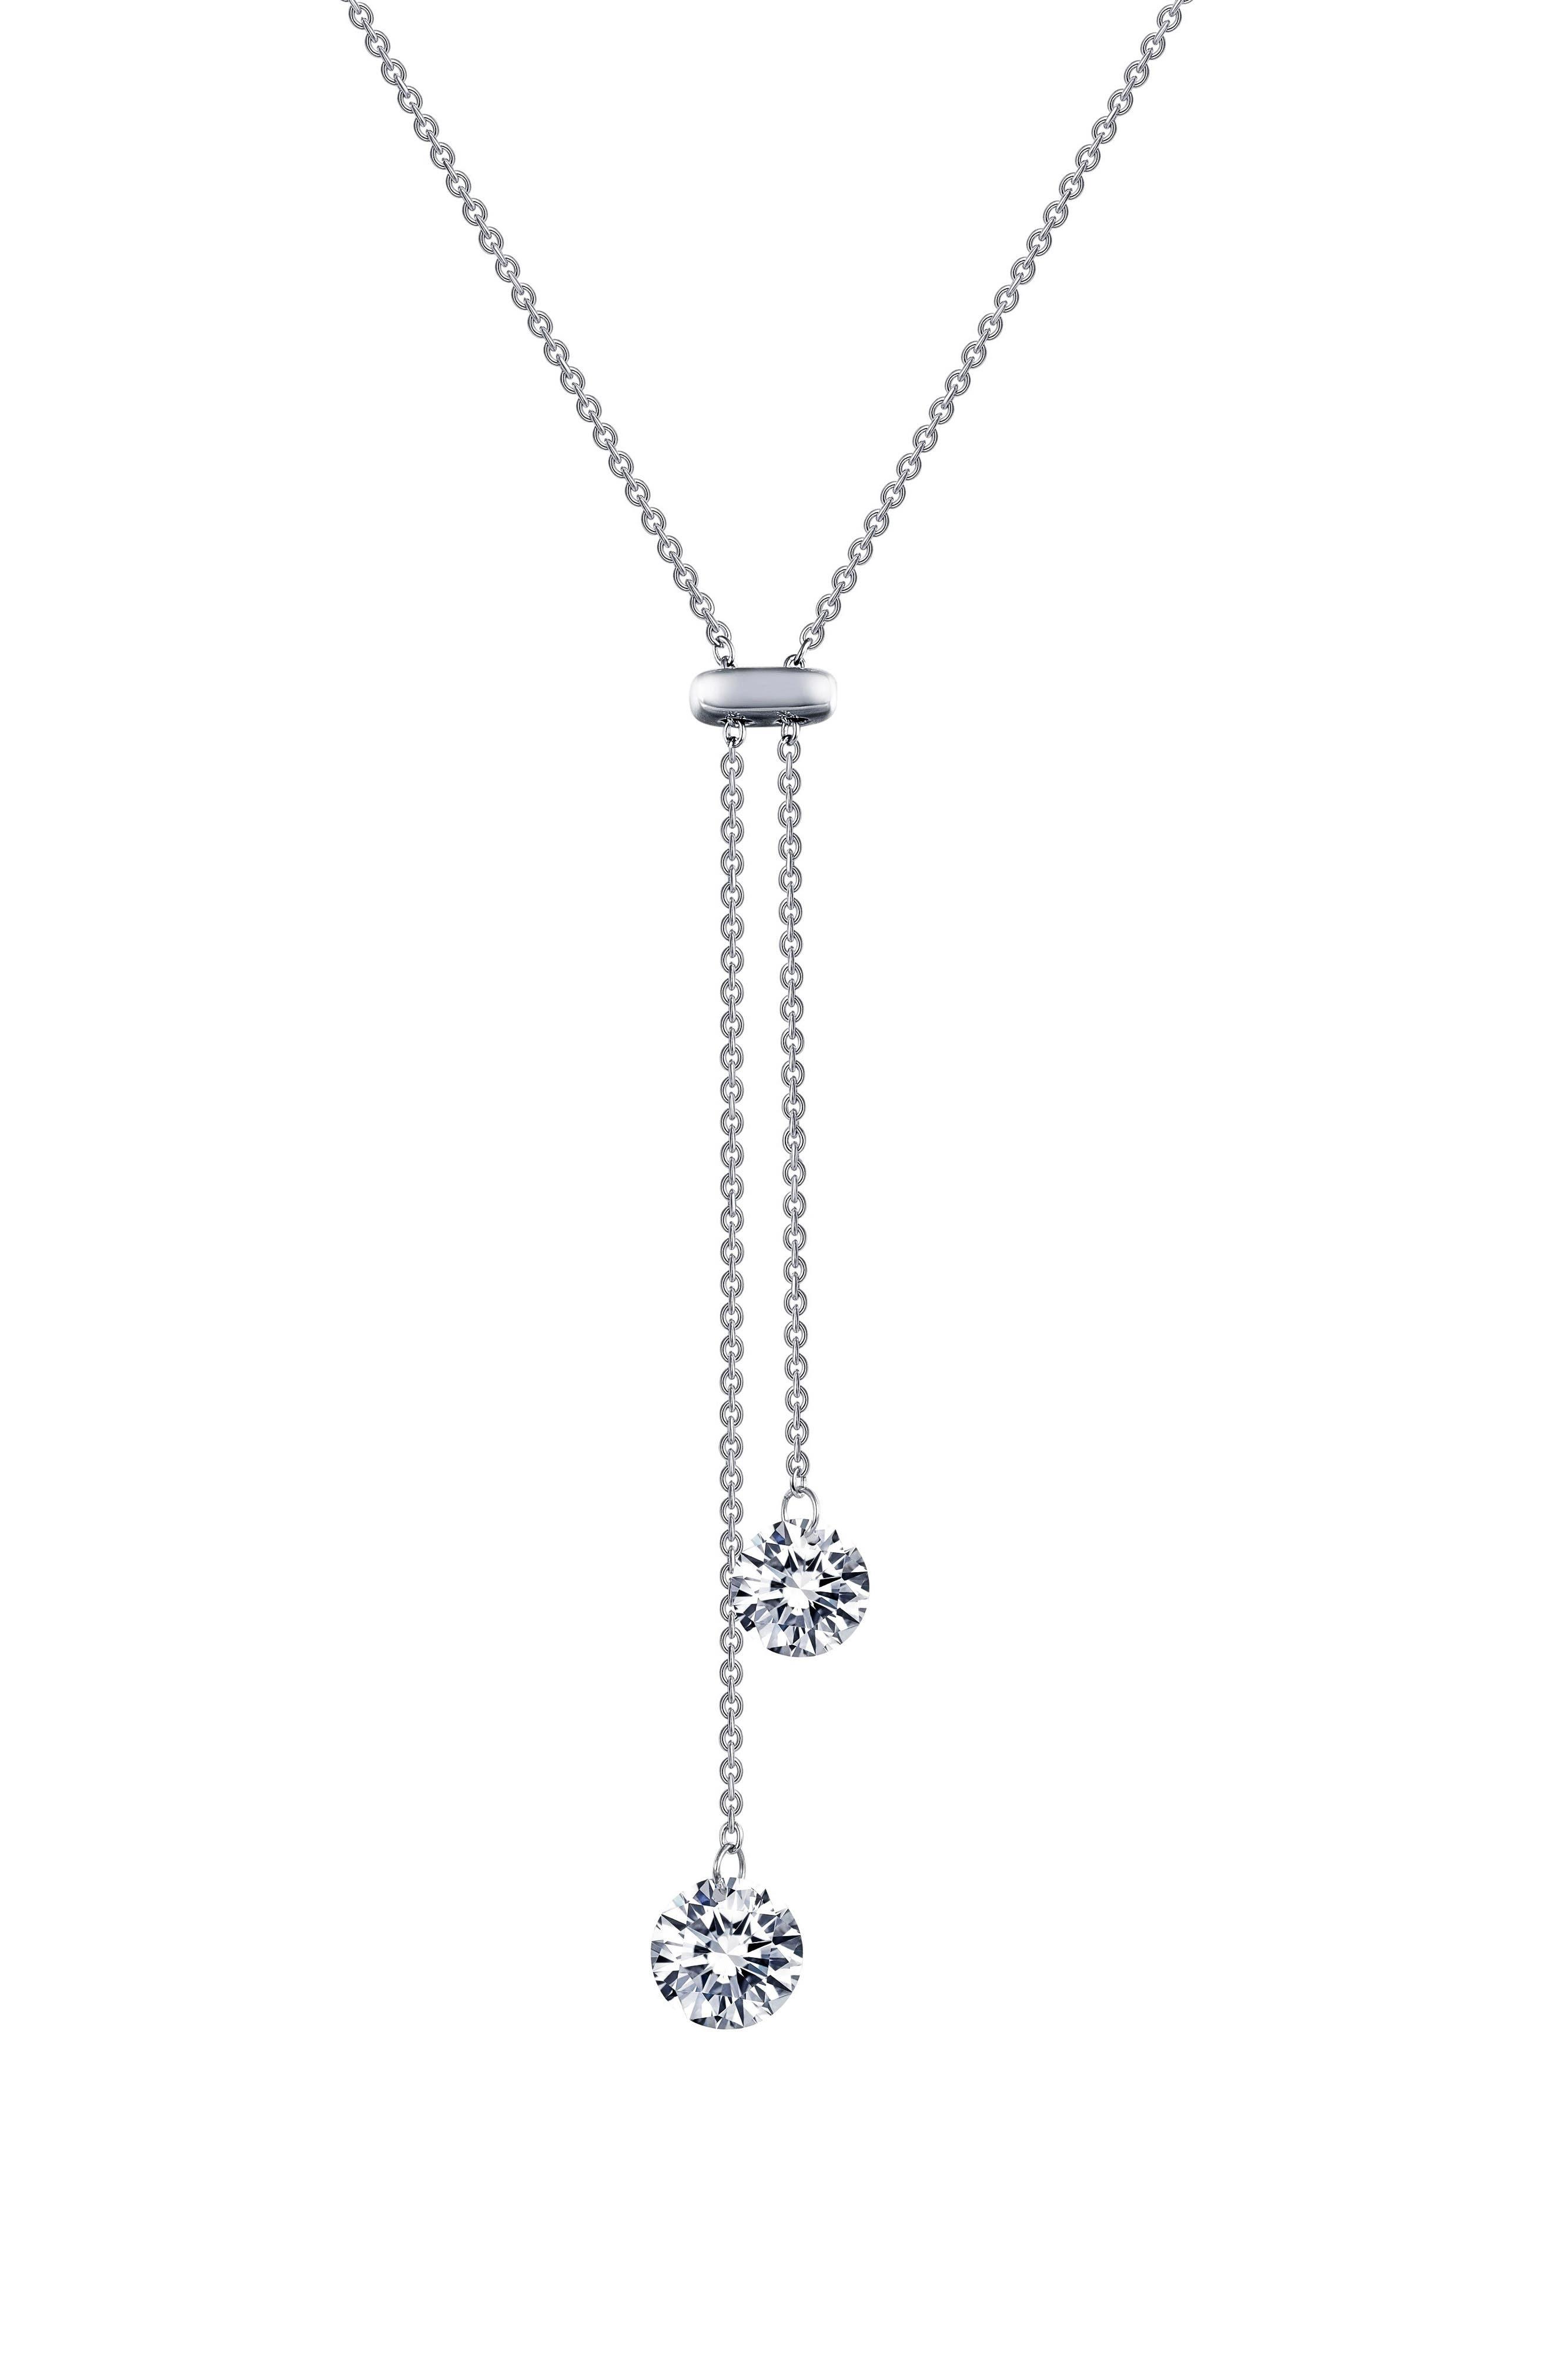 LaFonn Simulated Diamond Pendant Necklace